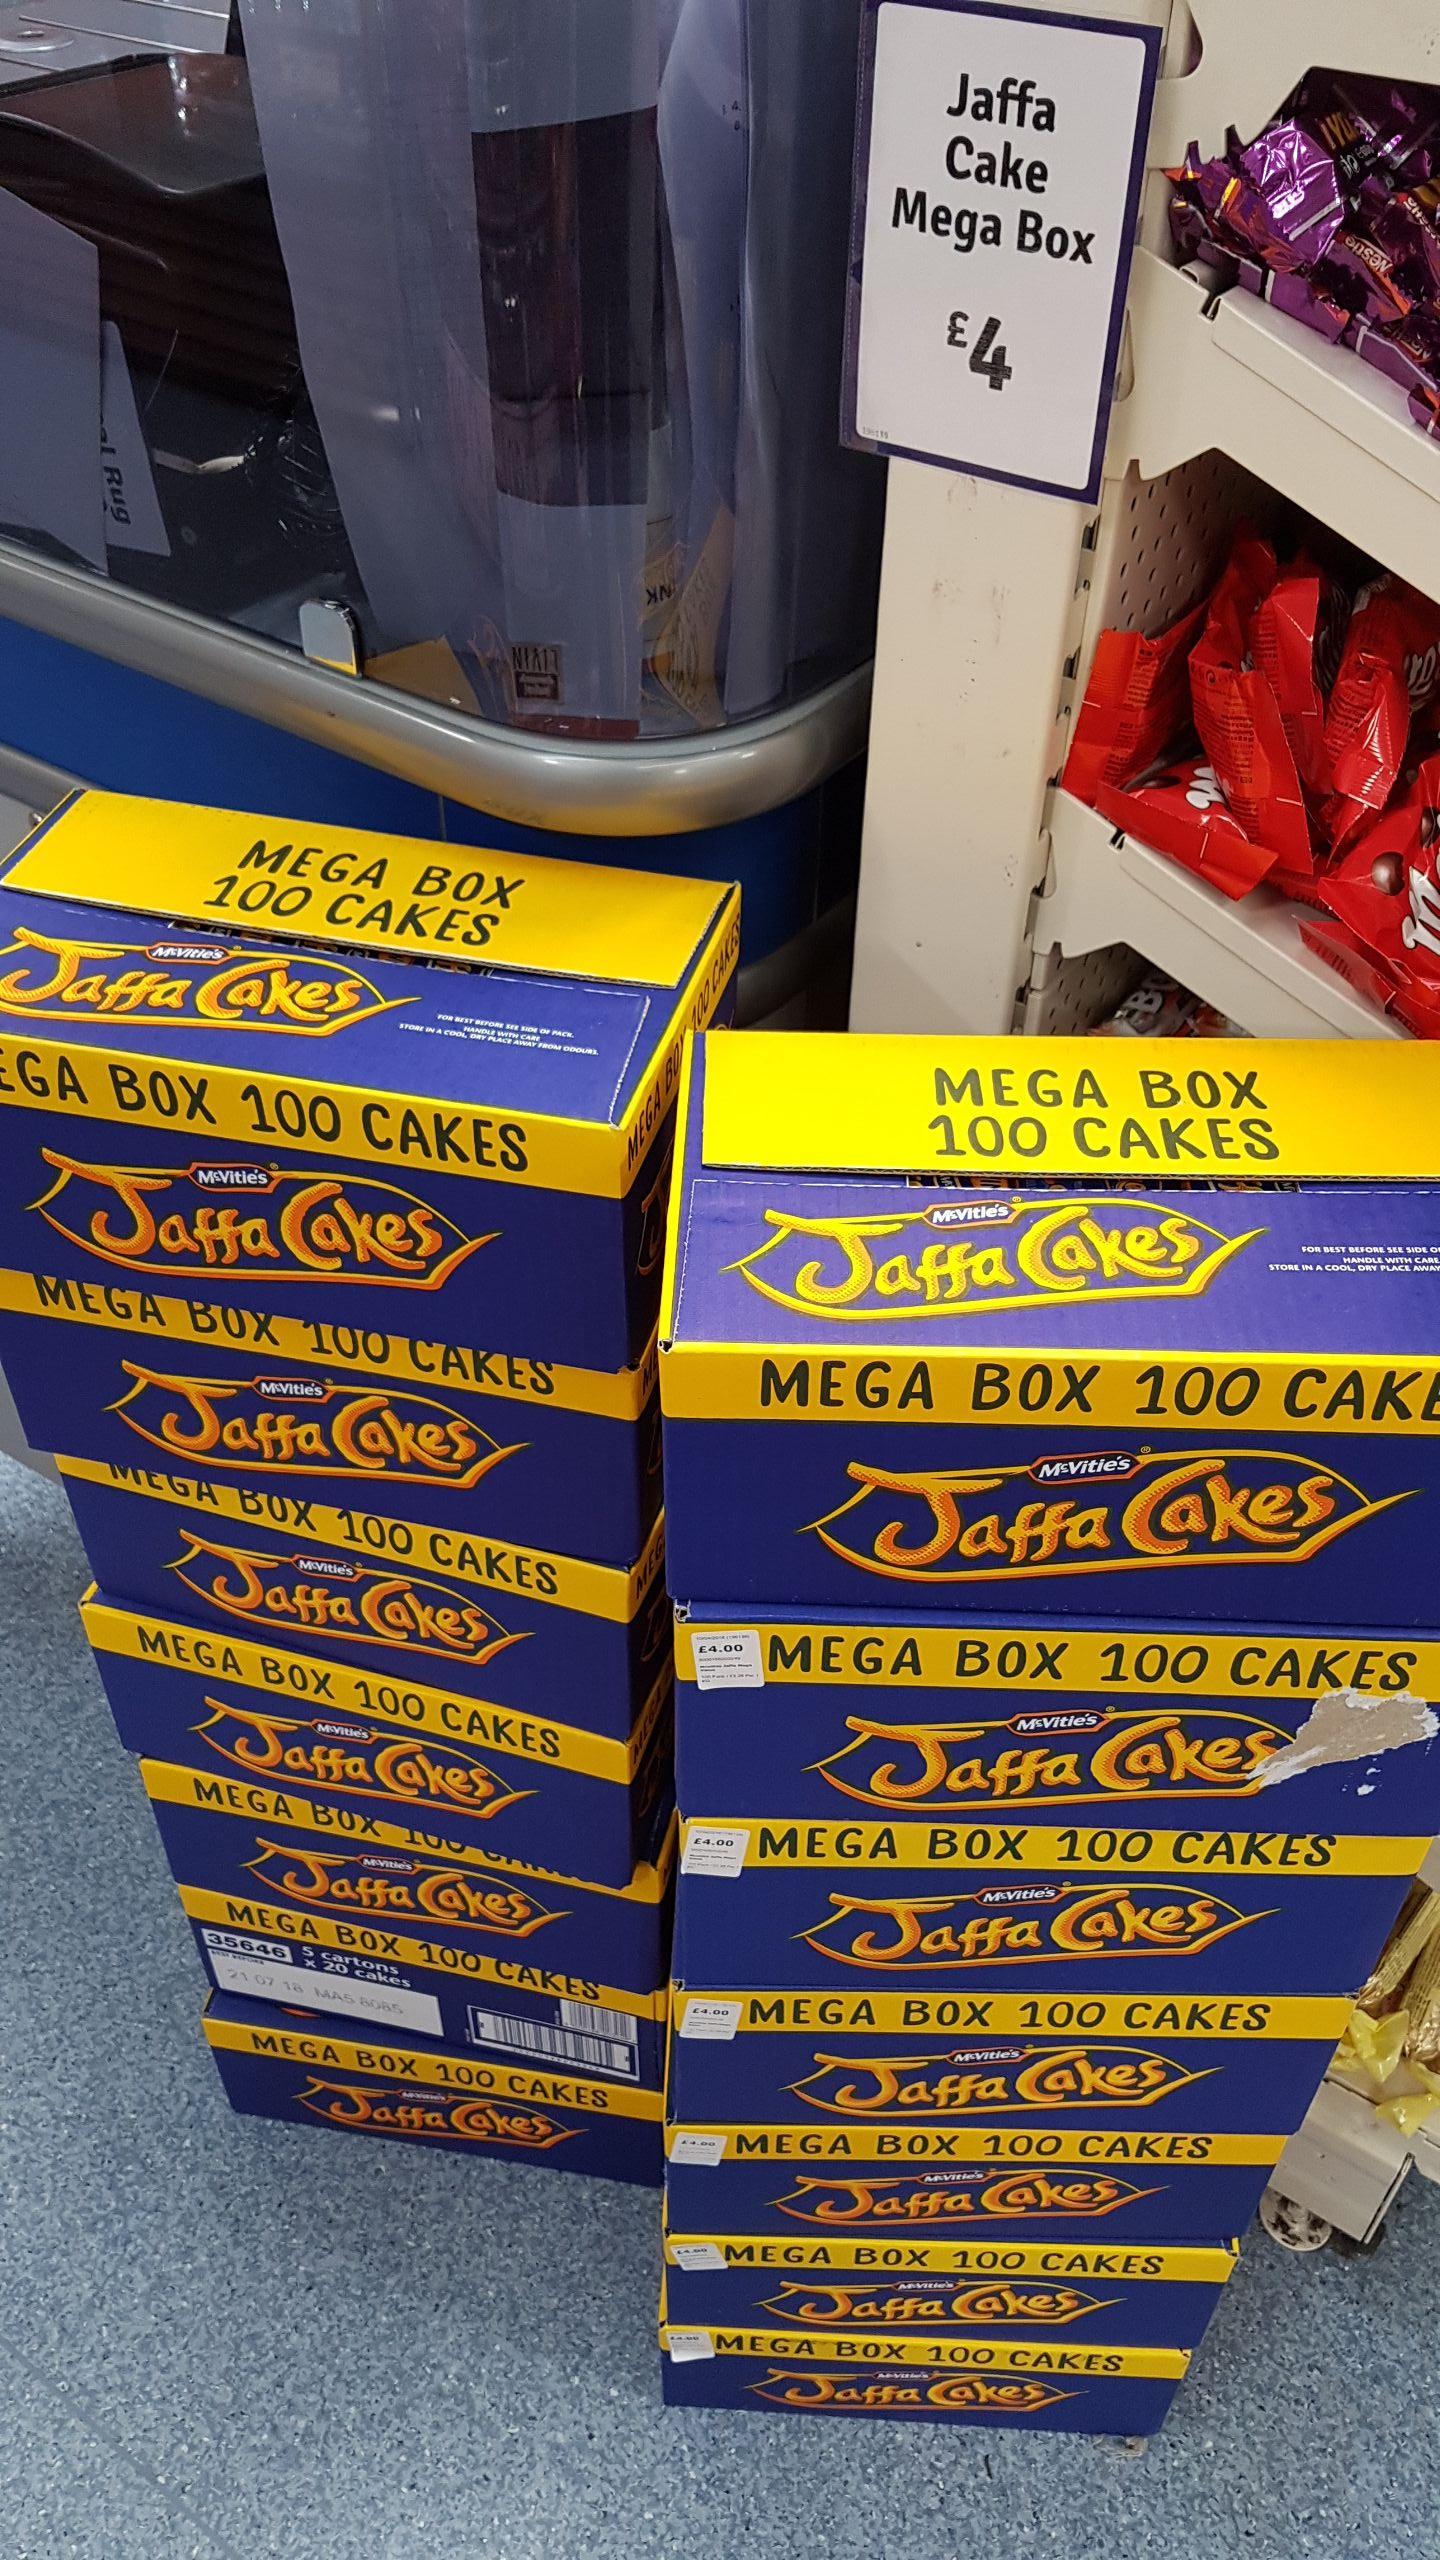 Mega box jaffa cakes 100 in a box - £4 instore @ the range